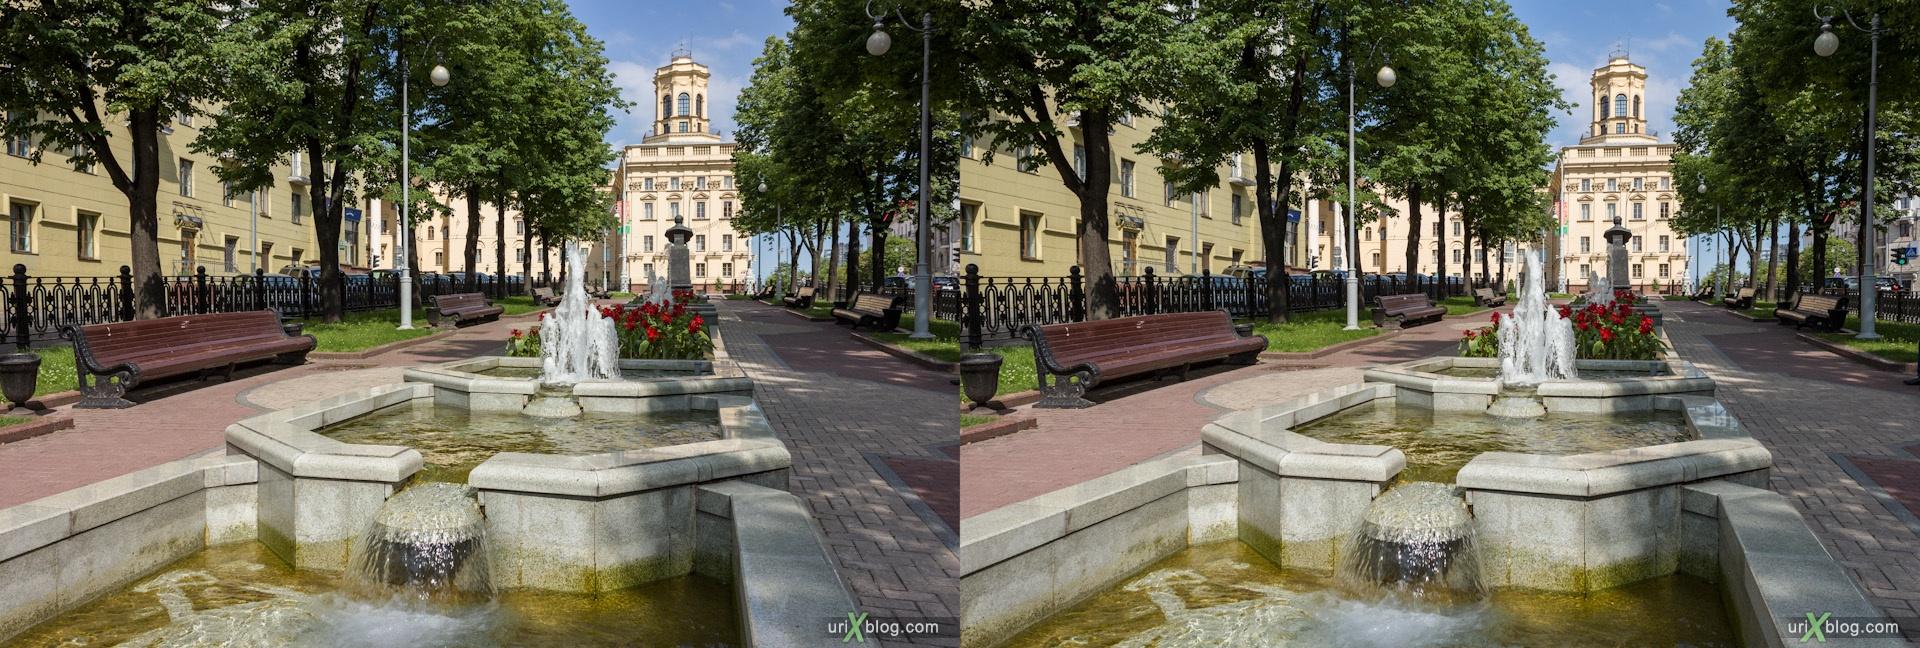 2012 Minsk Belarus stereo 3d